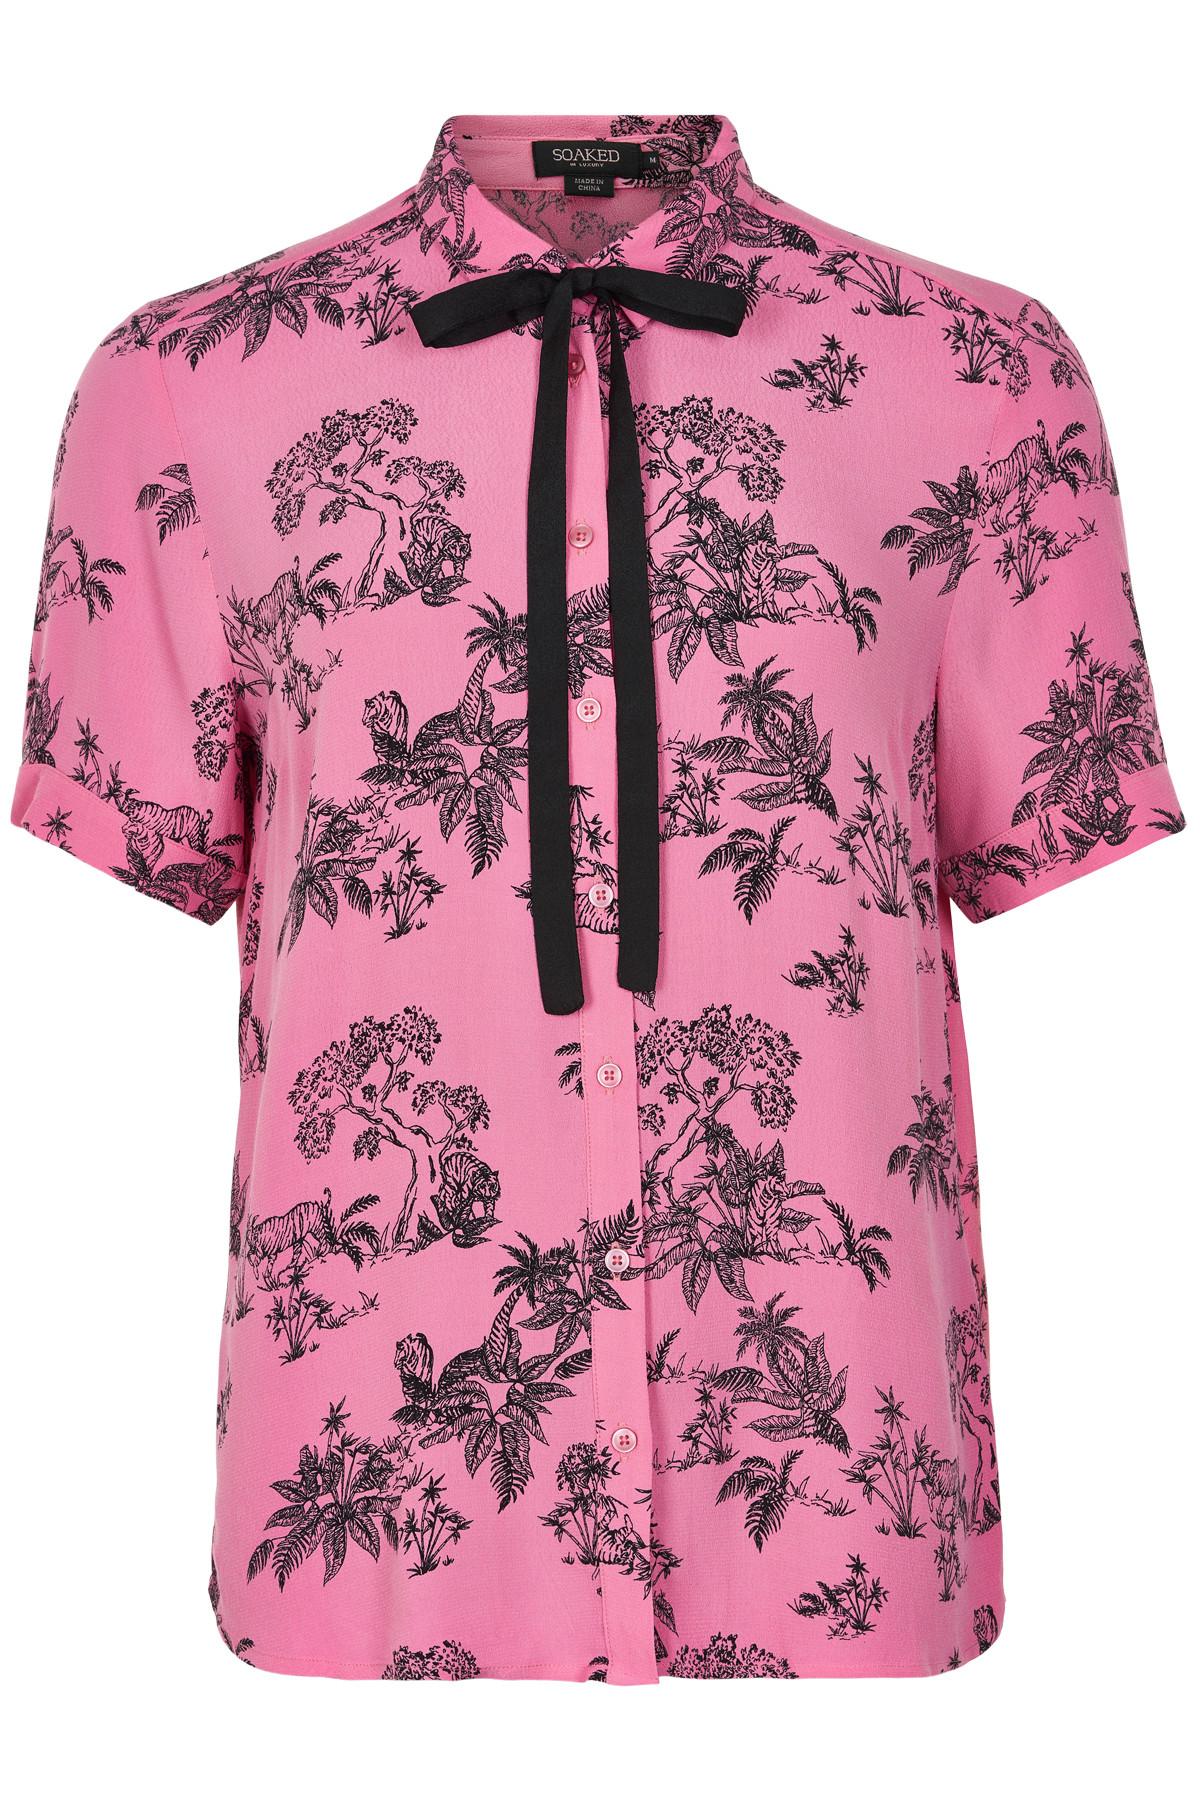 8982a3dd Shirt bluses online by Scandinavian designers - buy shirt blouses